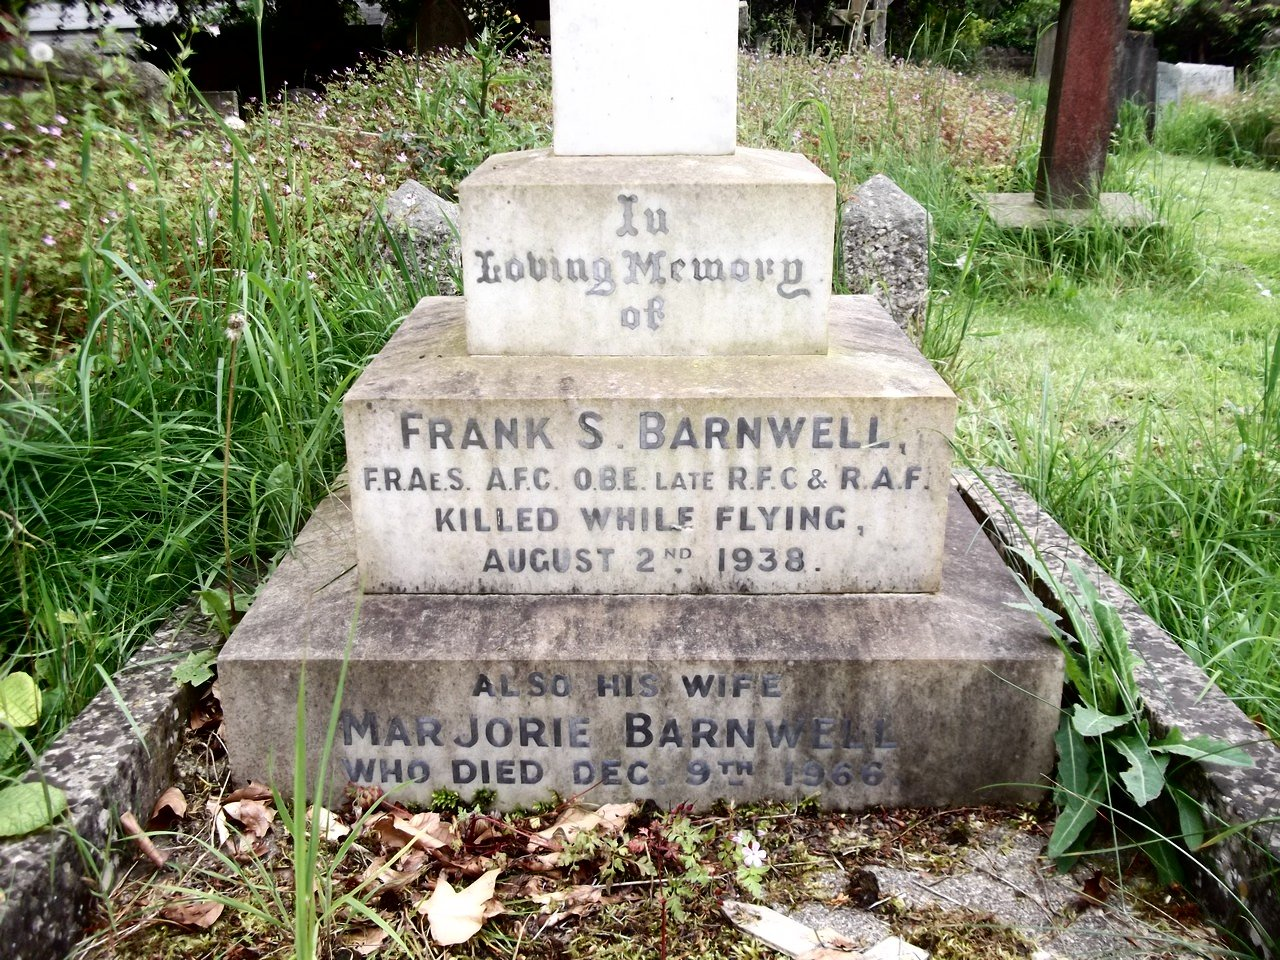 Headstone - Frank S Barnwell, Marjorie Sandes